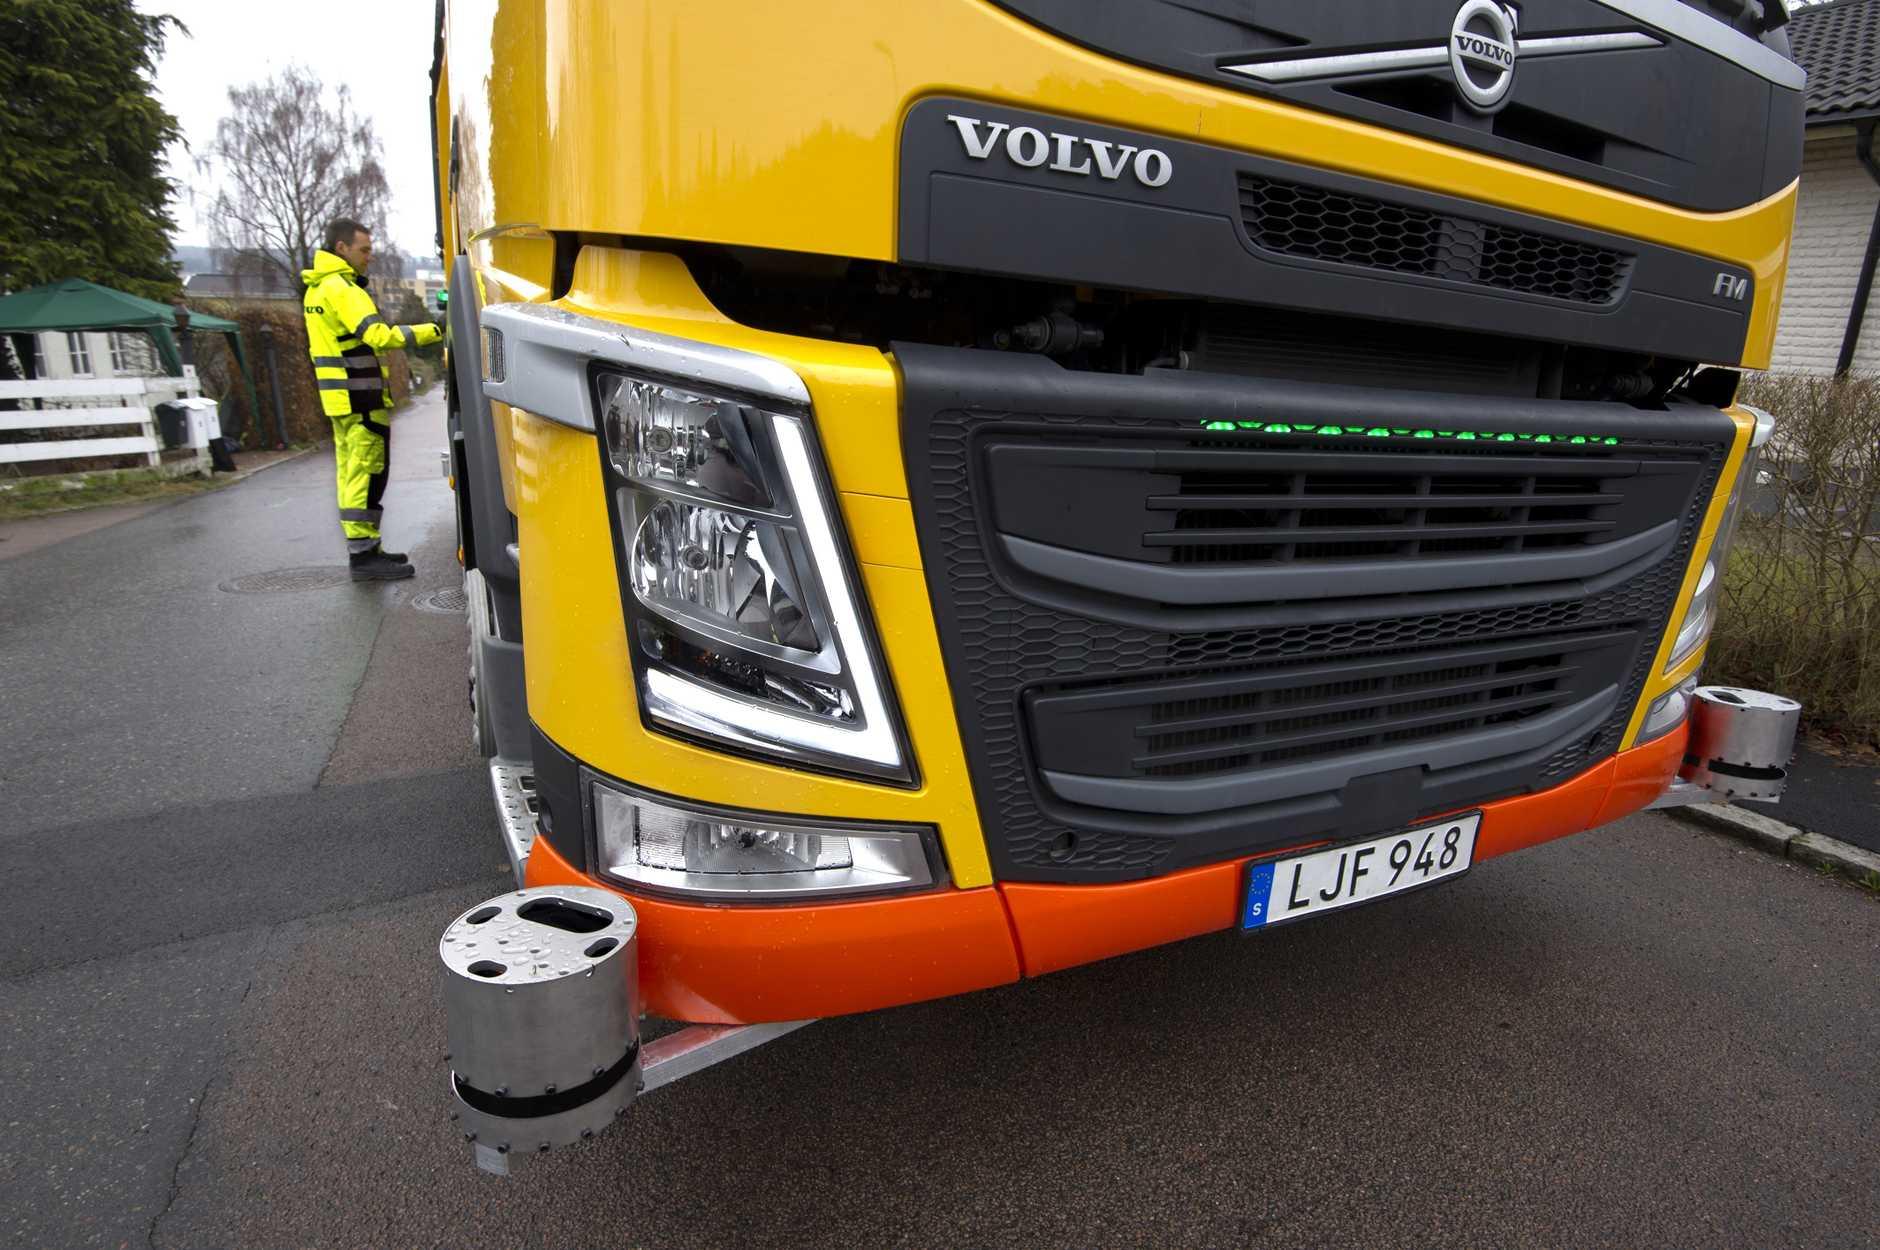 Sensors monitor the truck's surroundings as it reverses.